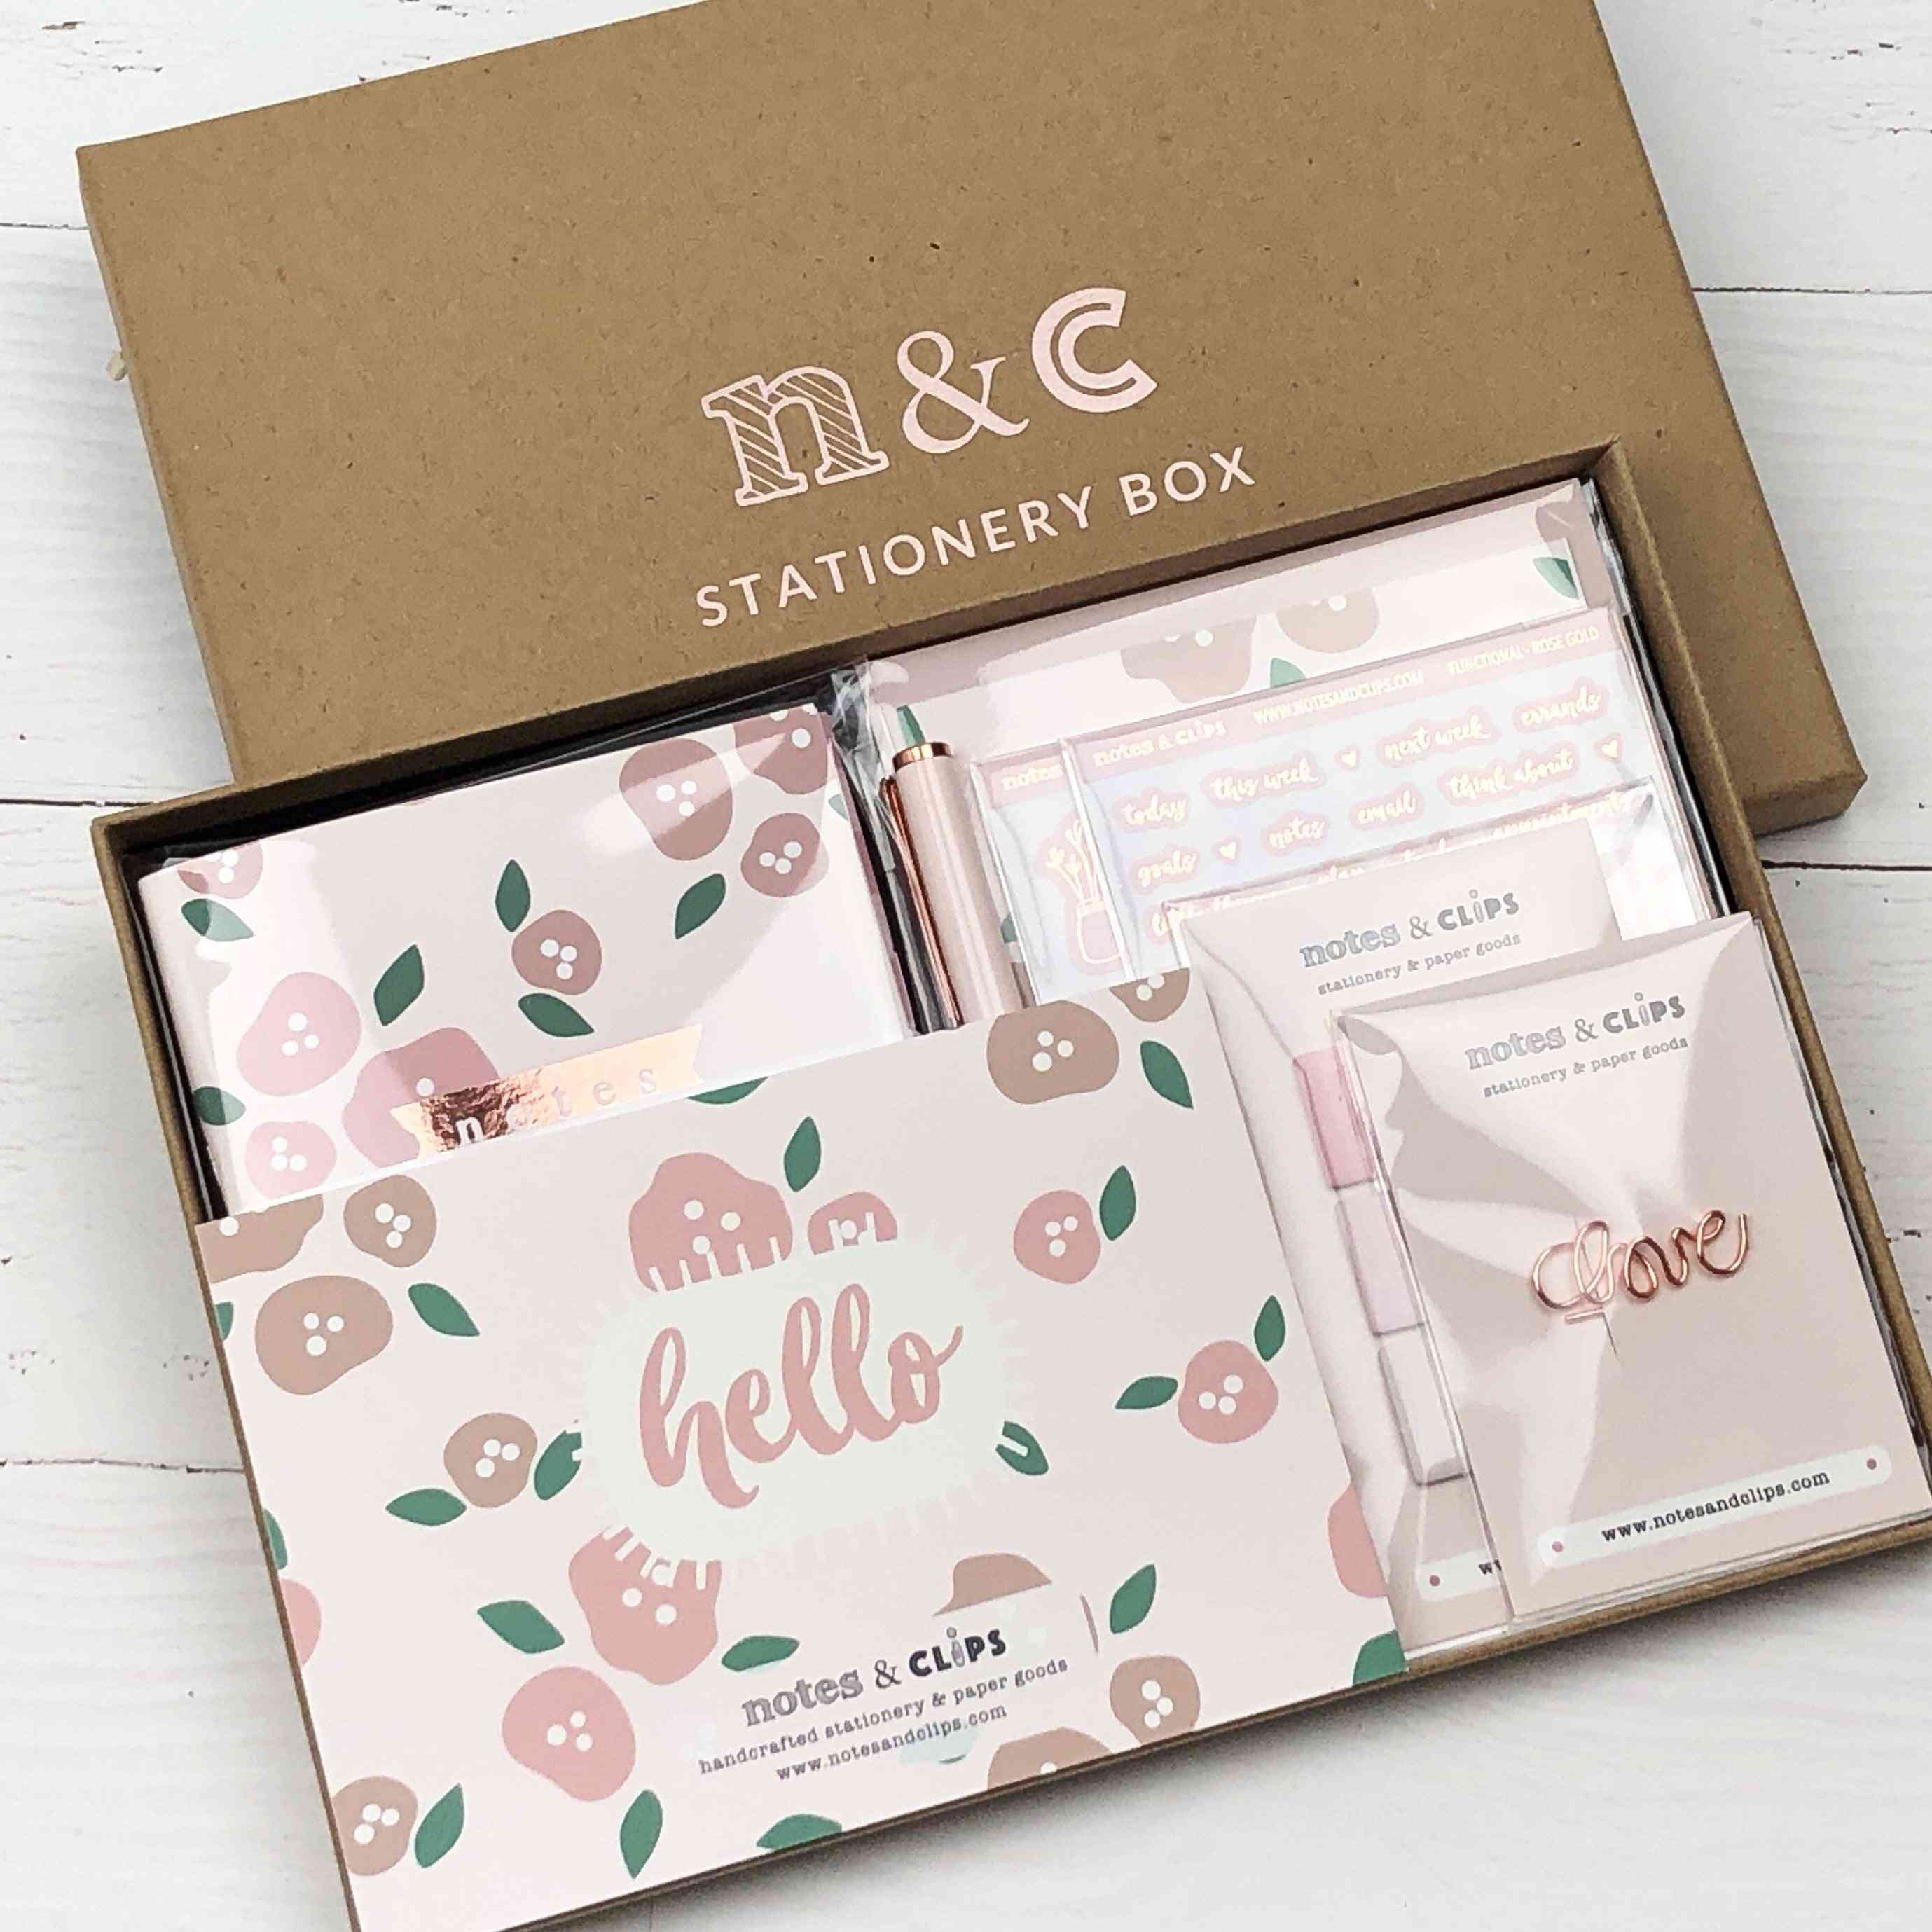 Stationery Box Blush Floral